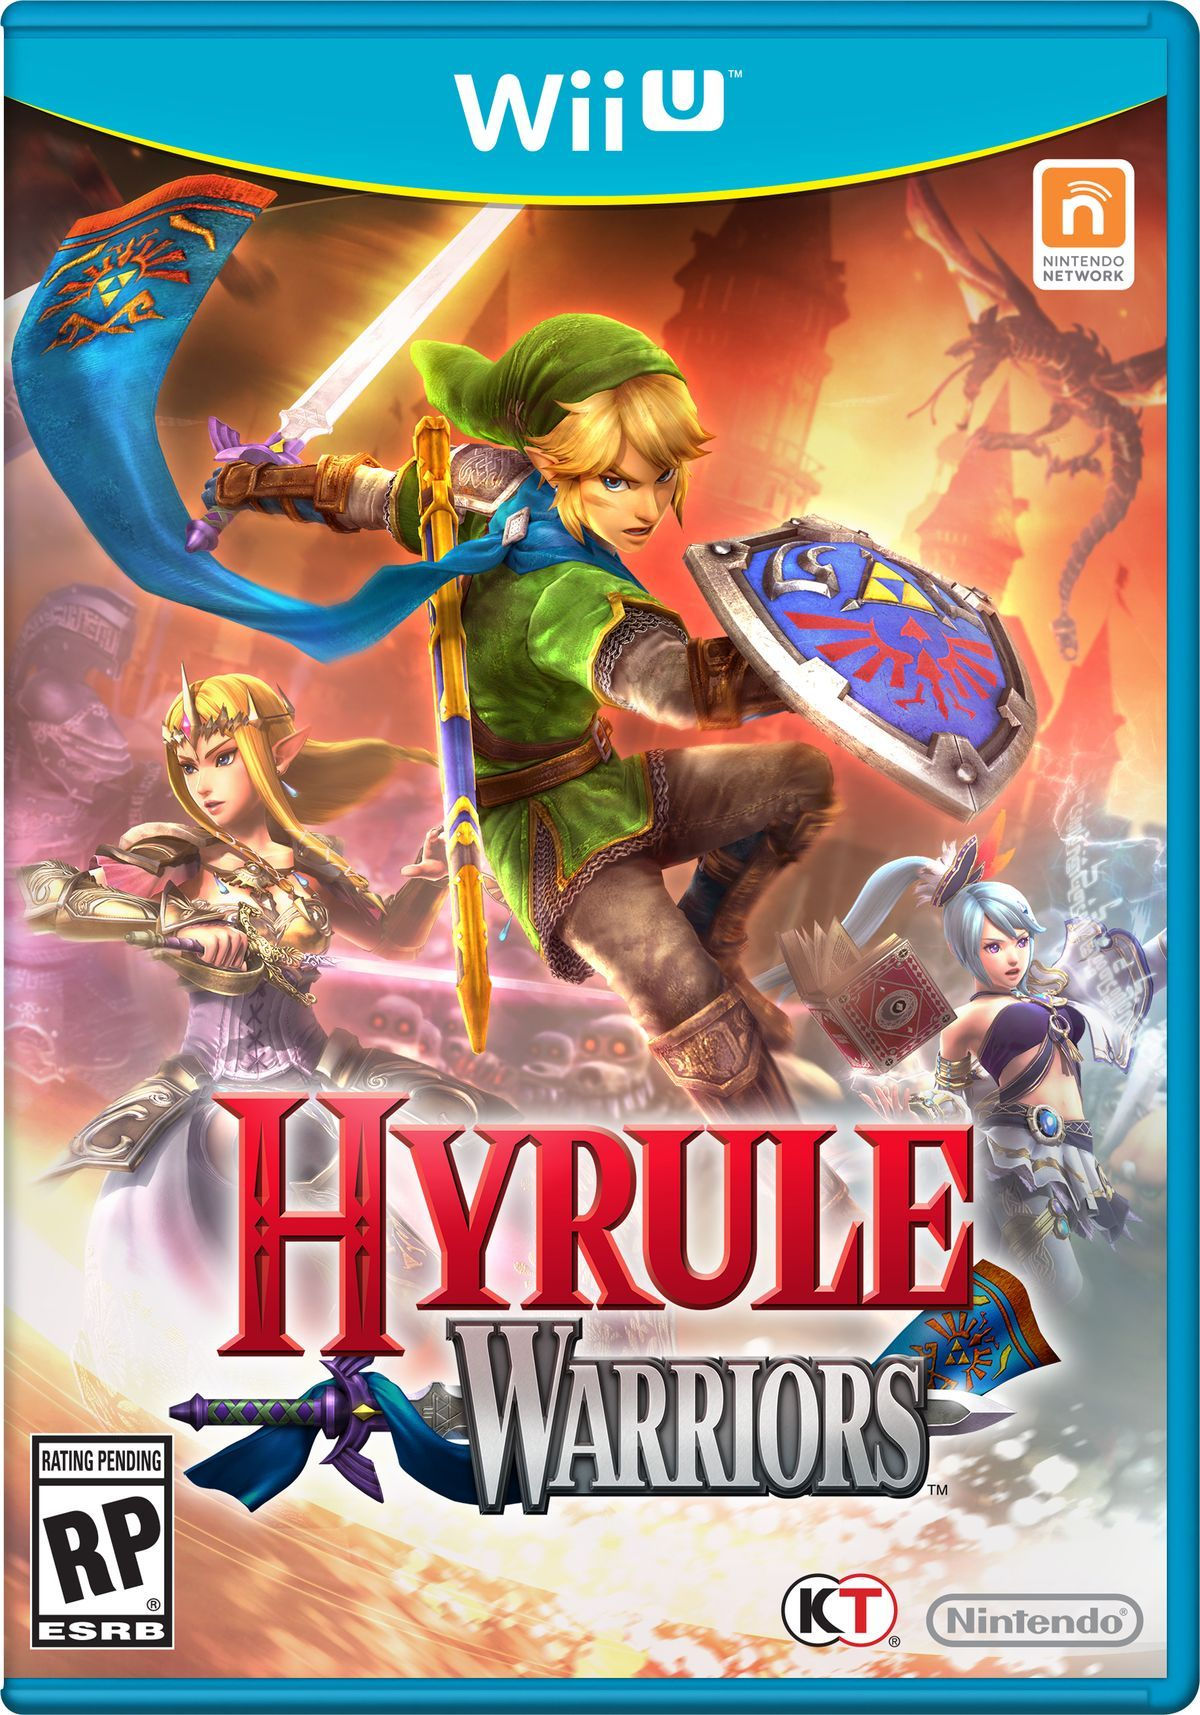 Hyrule Warriors (Wii U / Switch)